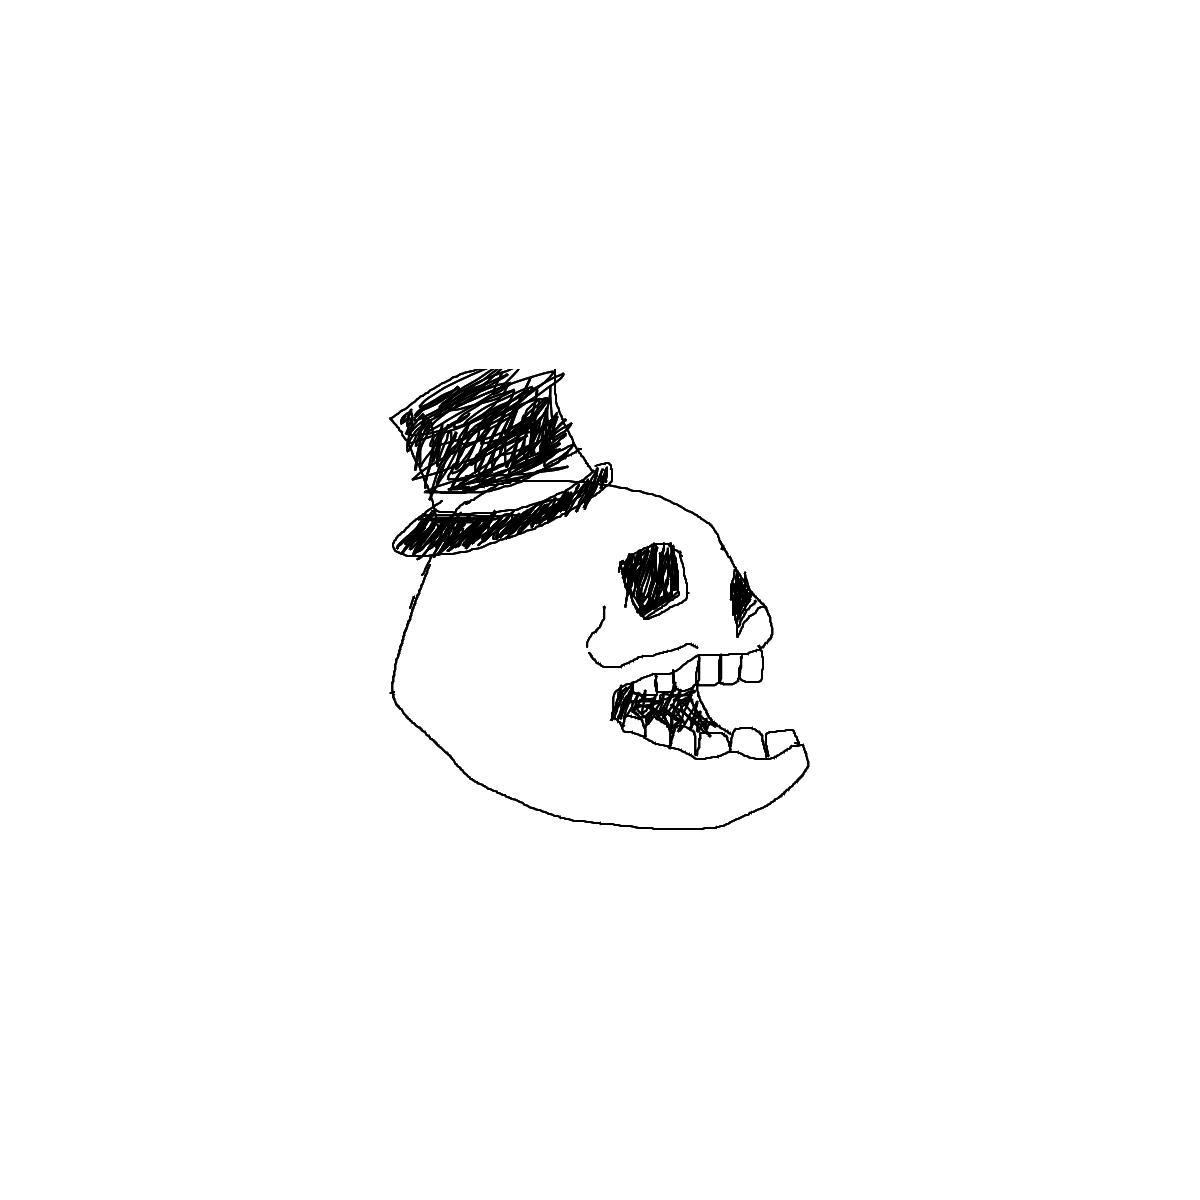 BAAAM drawing#694 lat:43.3194847106933600lng: -1.9931280612945557